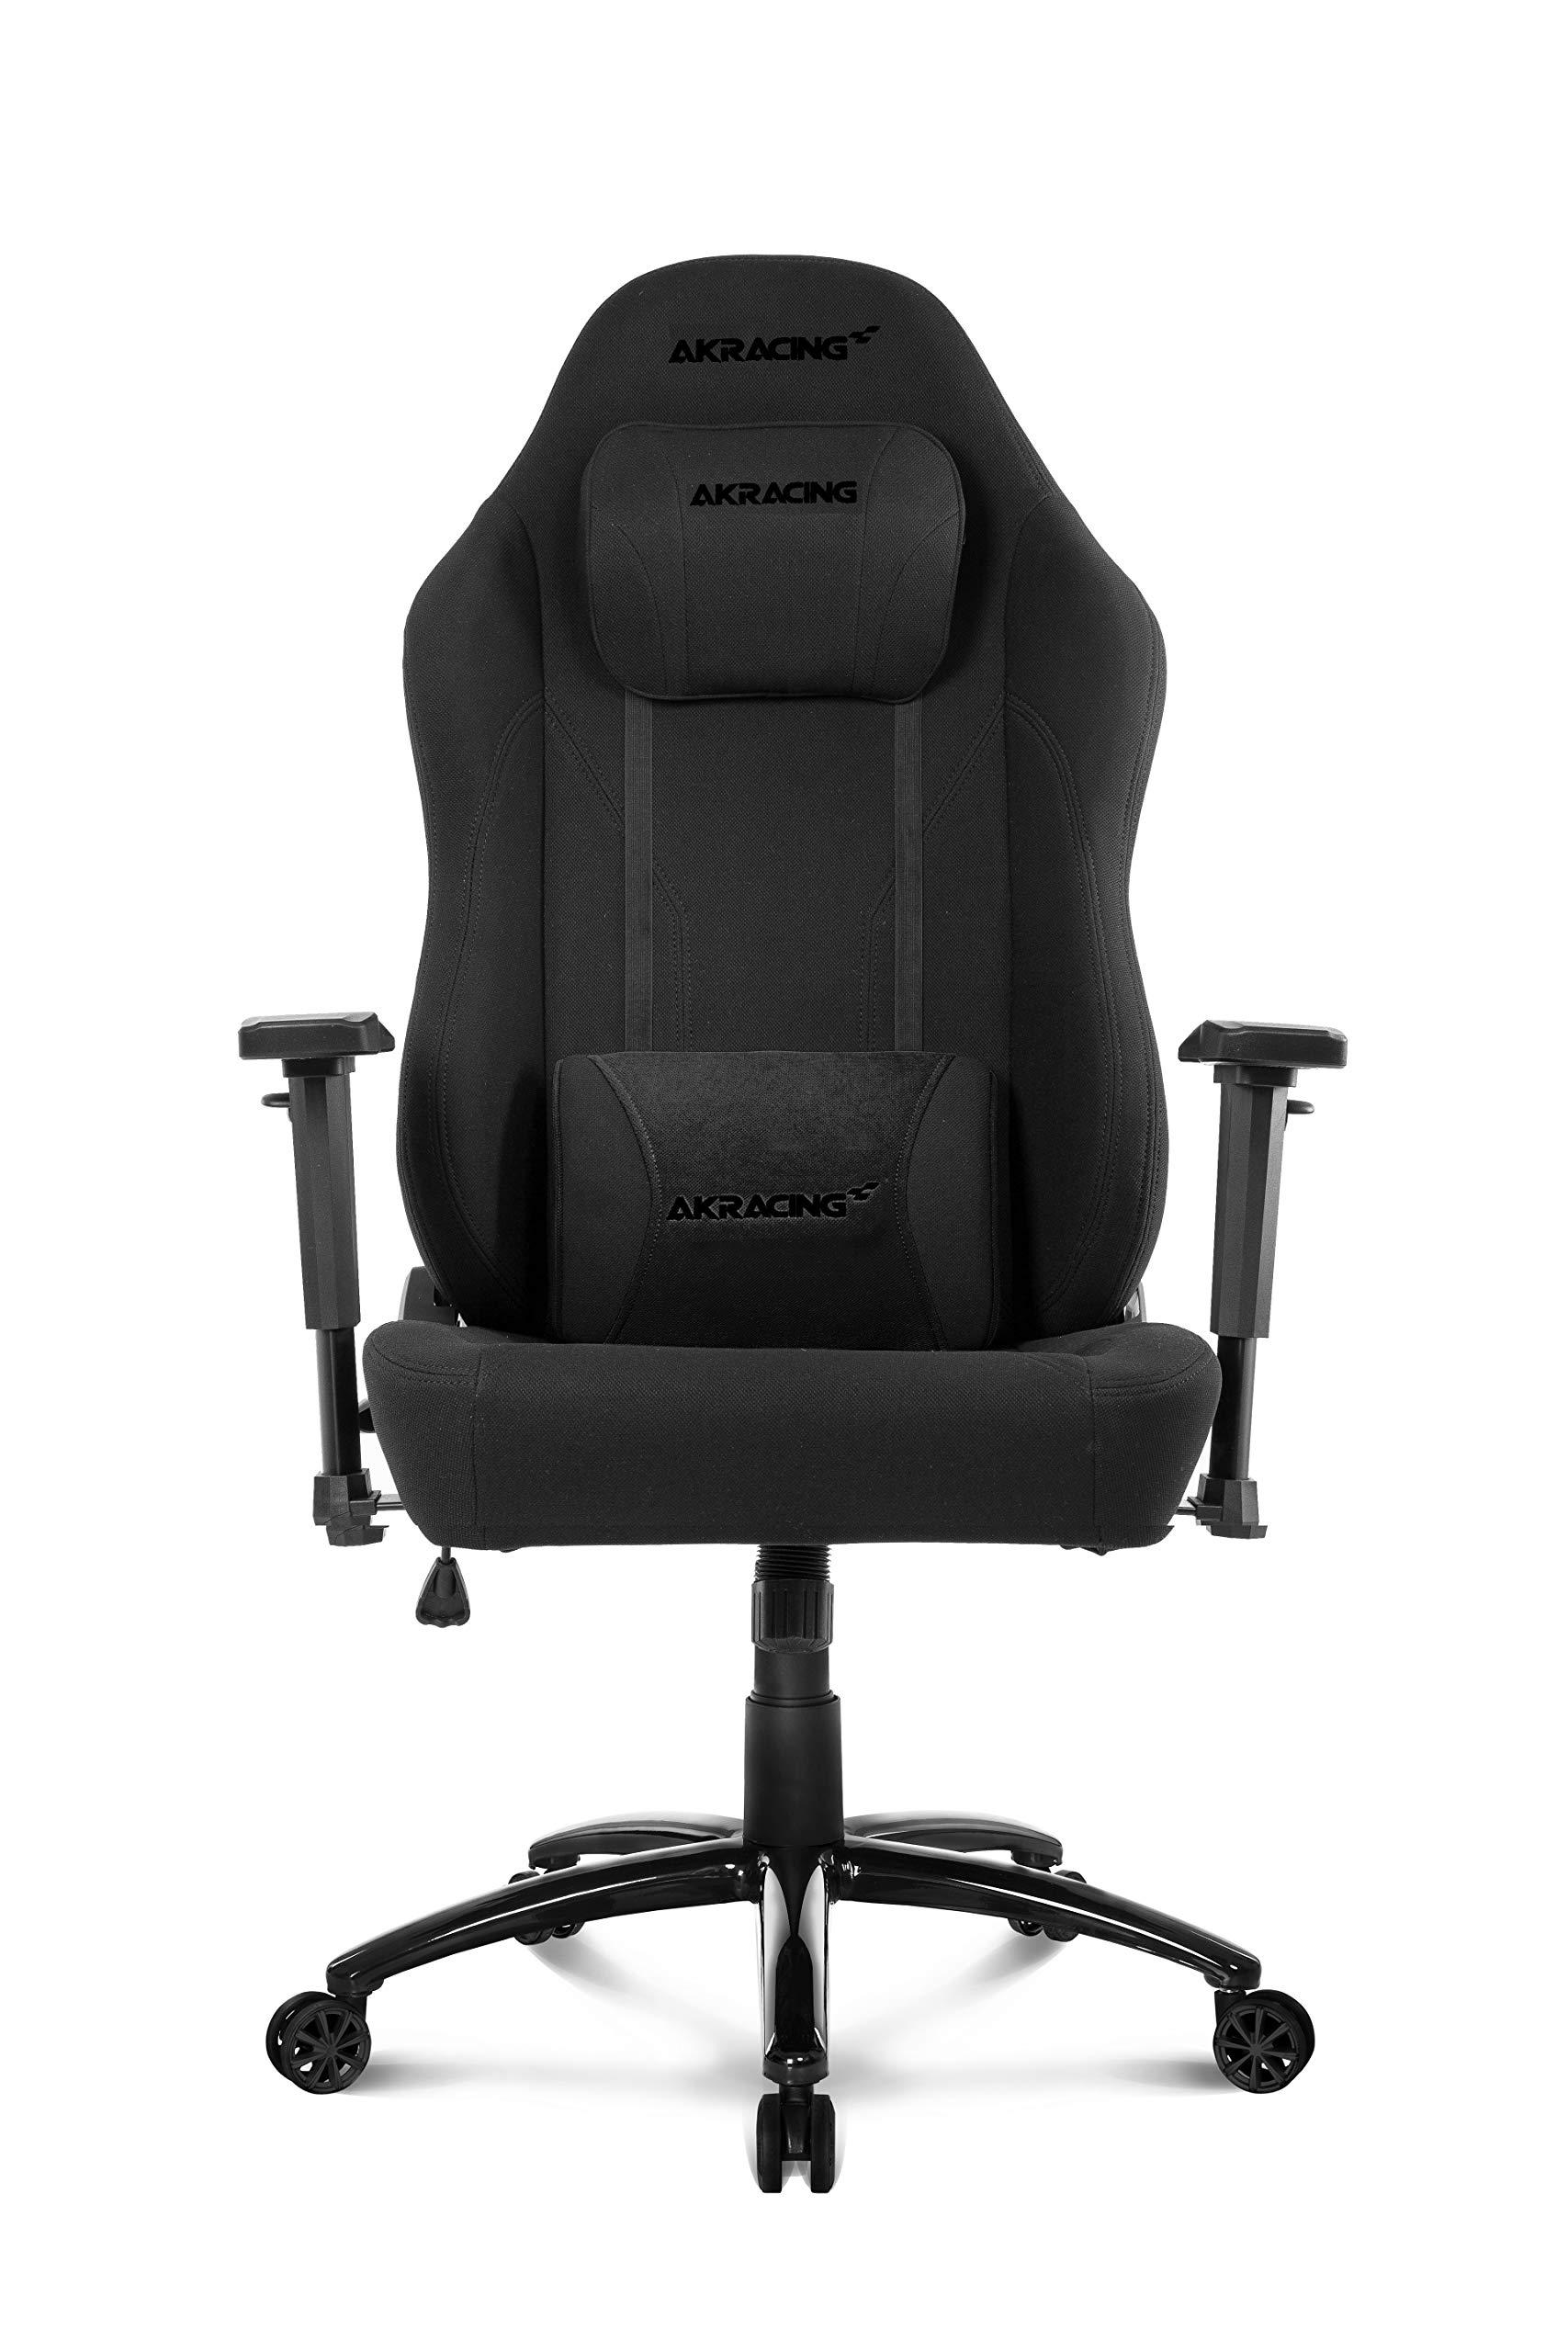 AKRacing Office Series Opal Ergonomic Computer Chair with High Backrest, Recliner, Swivel, Tilt, Rocker and Seat Height Adjustment Mechanisms with 5/10 warranty